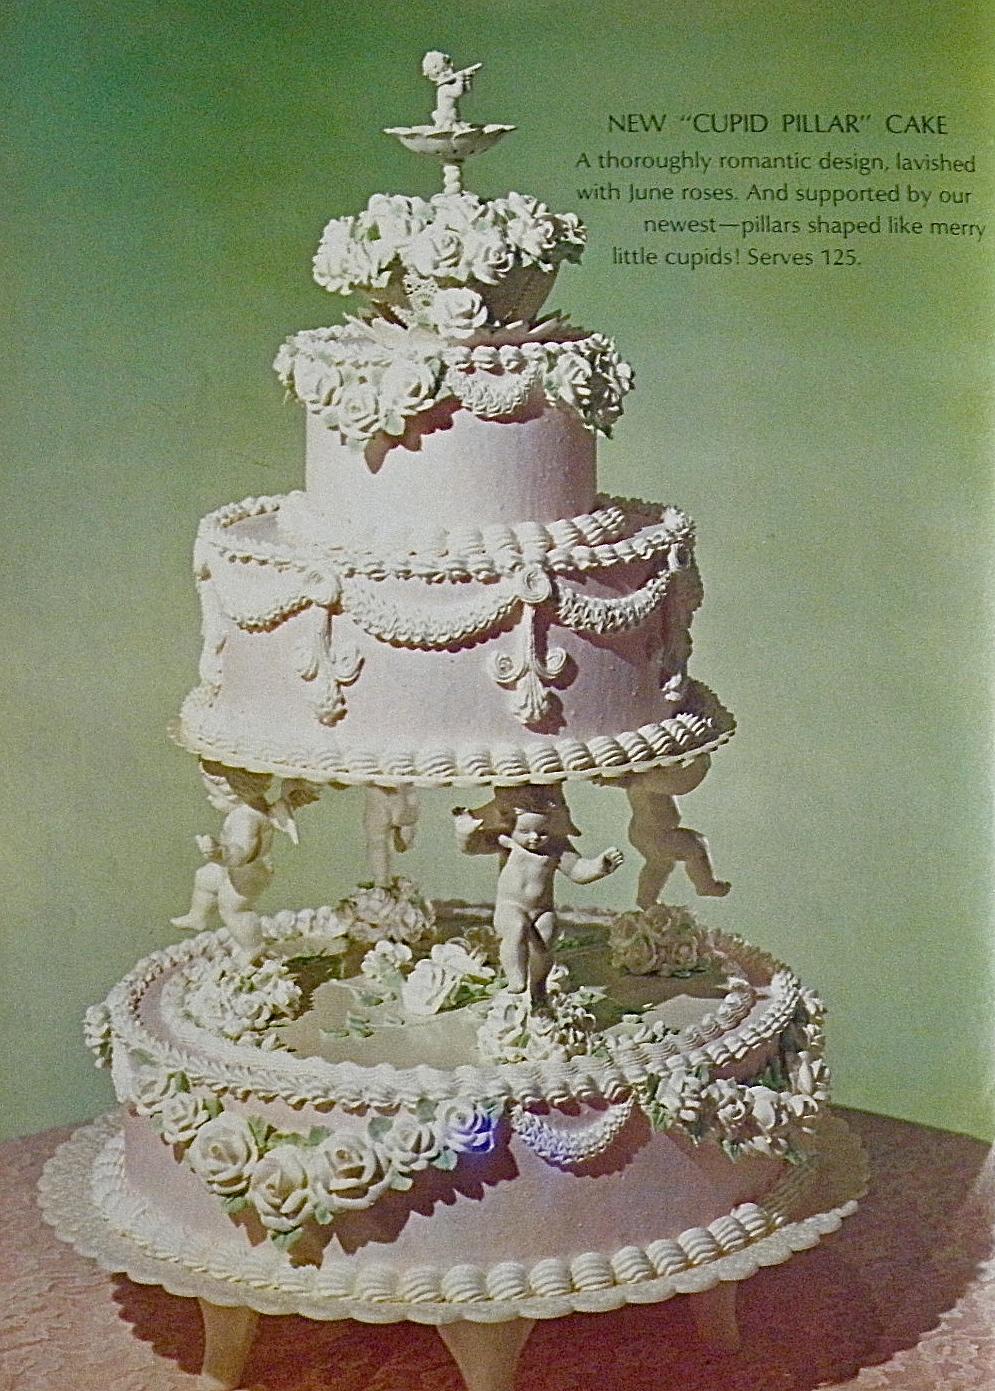 Wedding Cake Pillars And Plates & Decorator Preferred ...